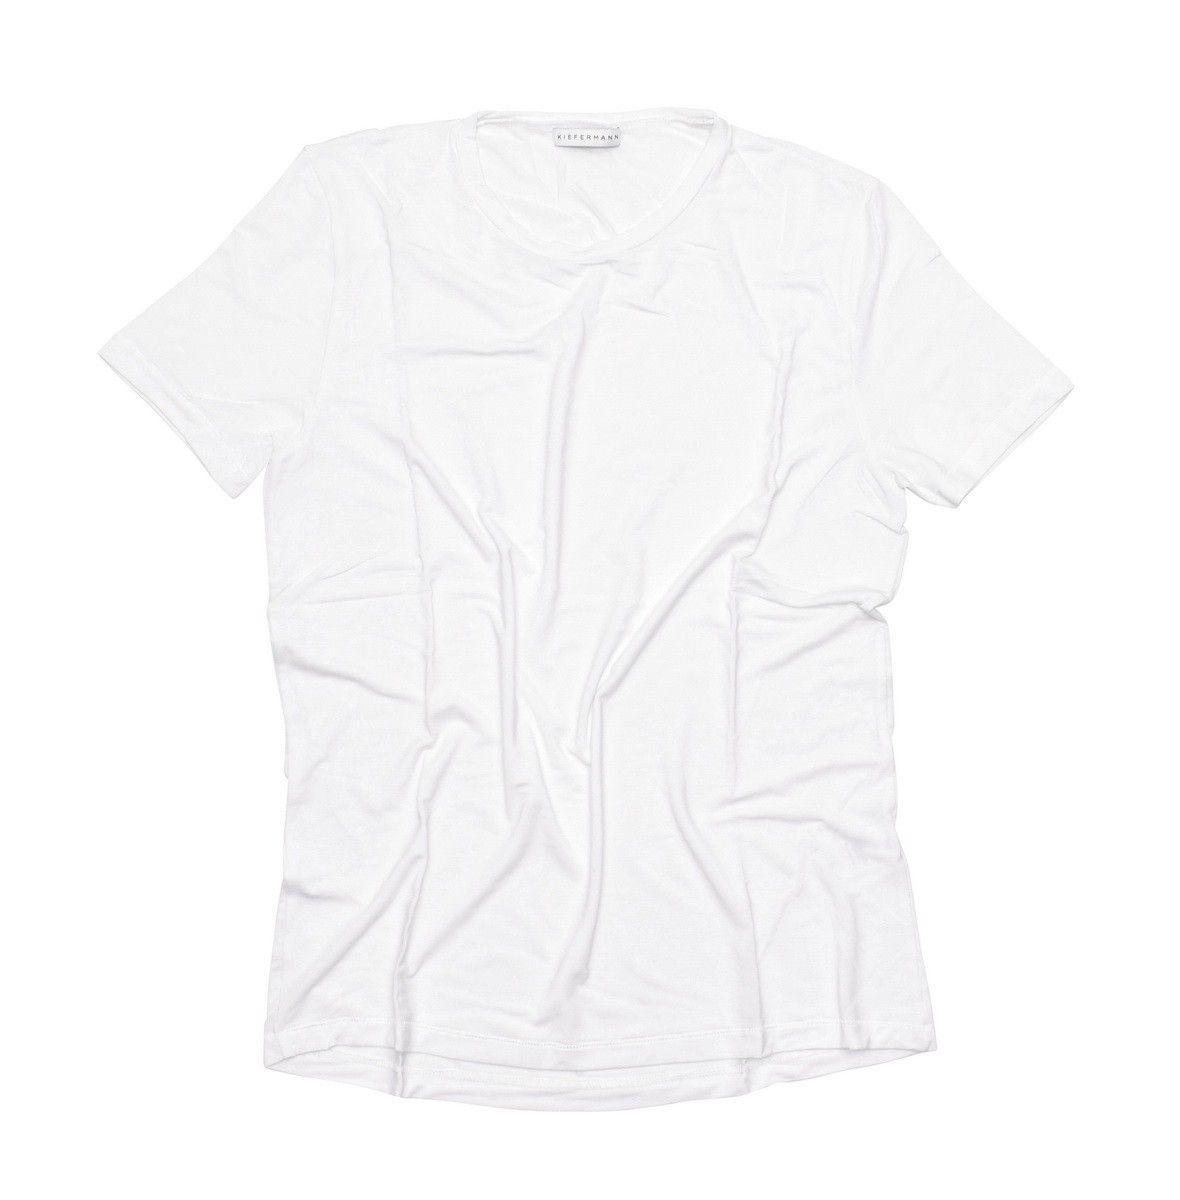 KIEFERMANN - Herren T-Shirt - Damian - White